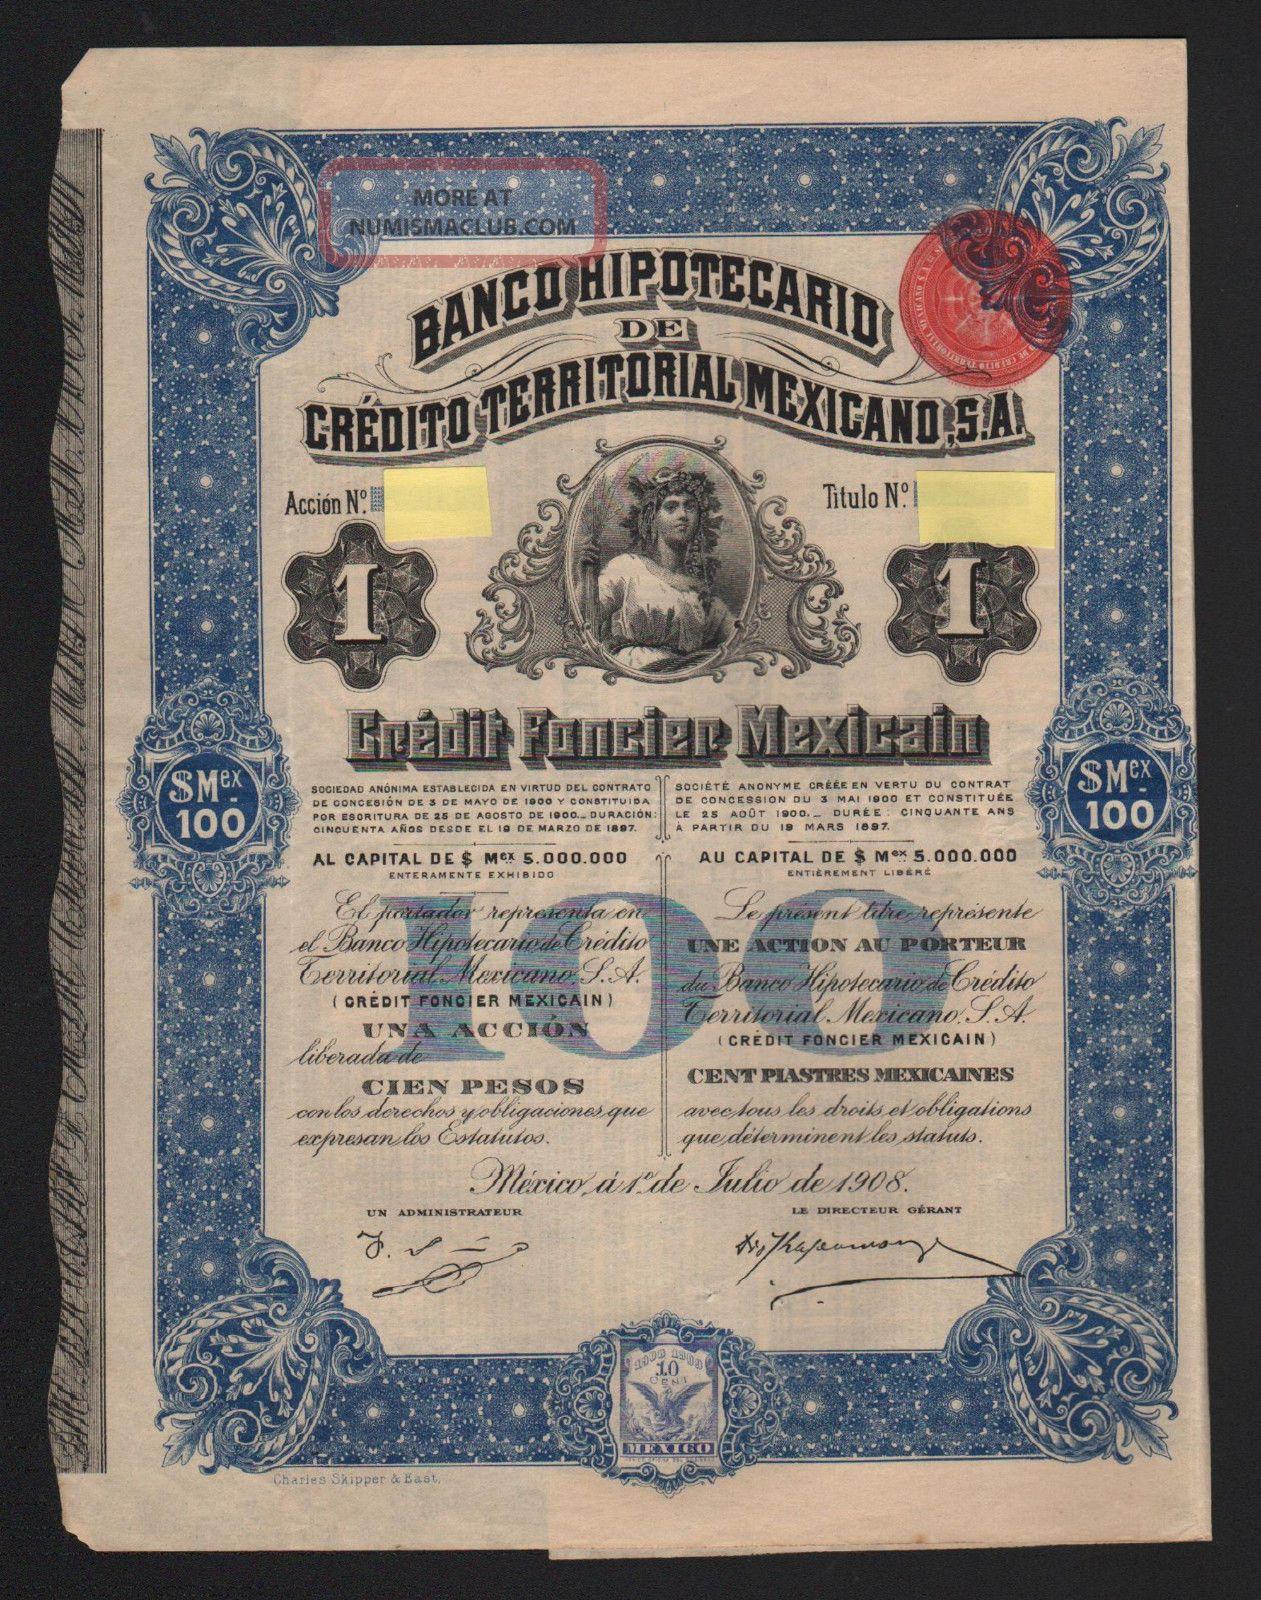 Banco Hypotecario De Credito Territoral Mexicano 1908 Stocks & Bonds, Scripophily photo